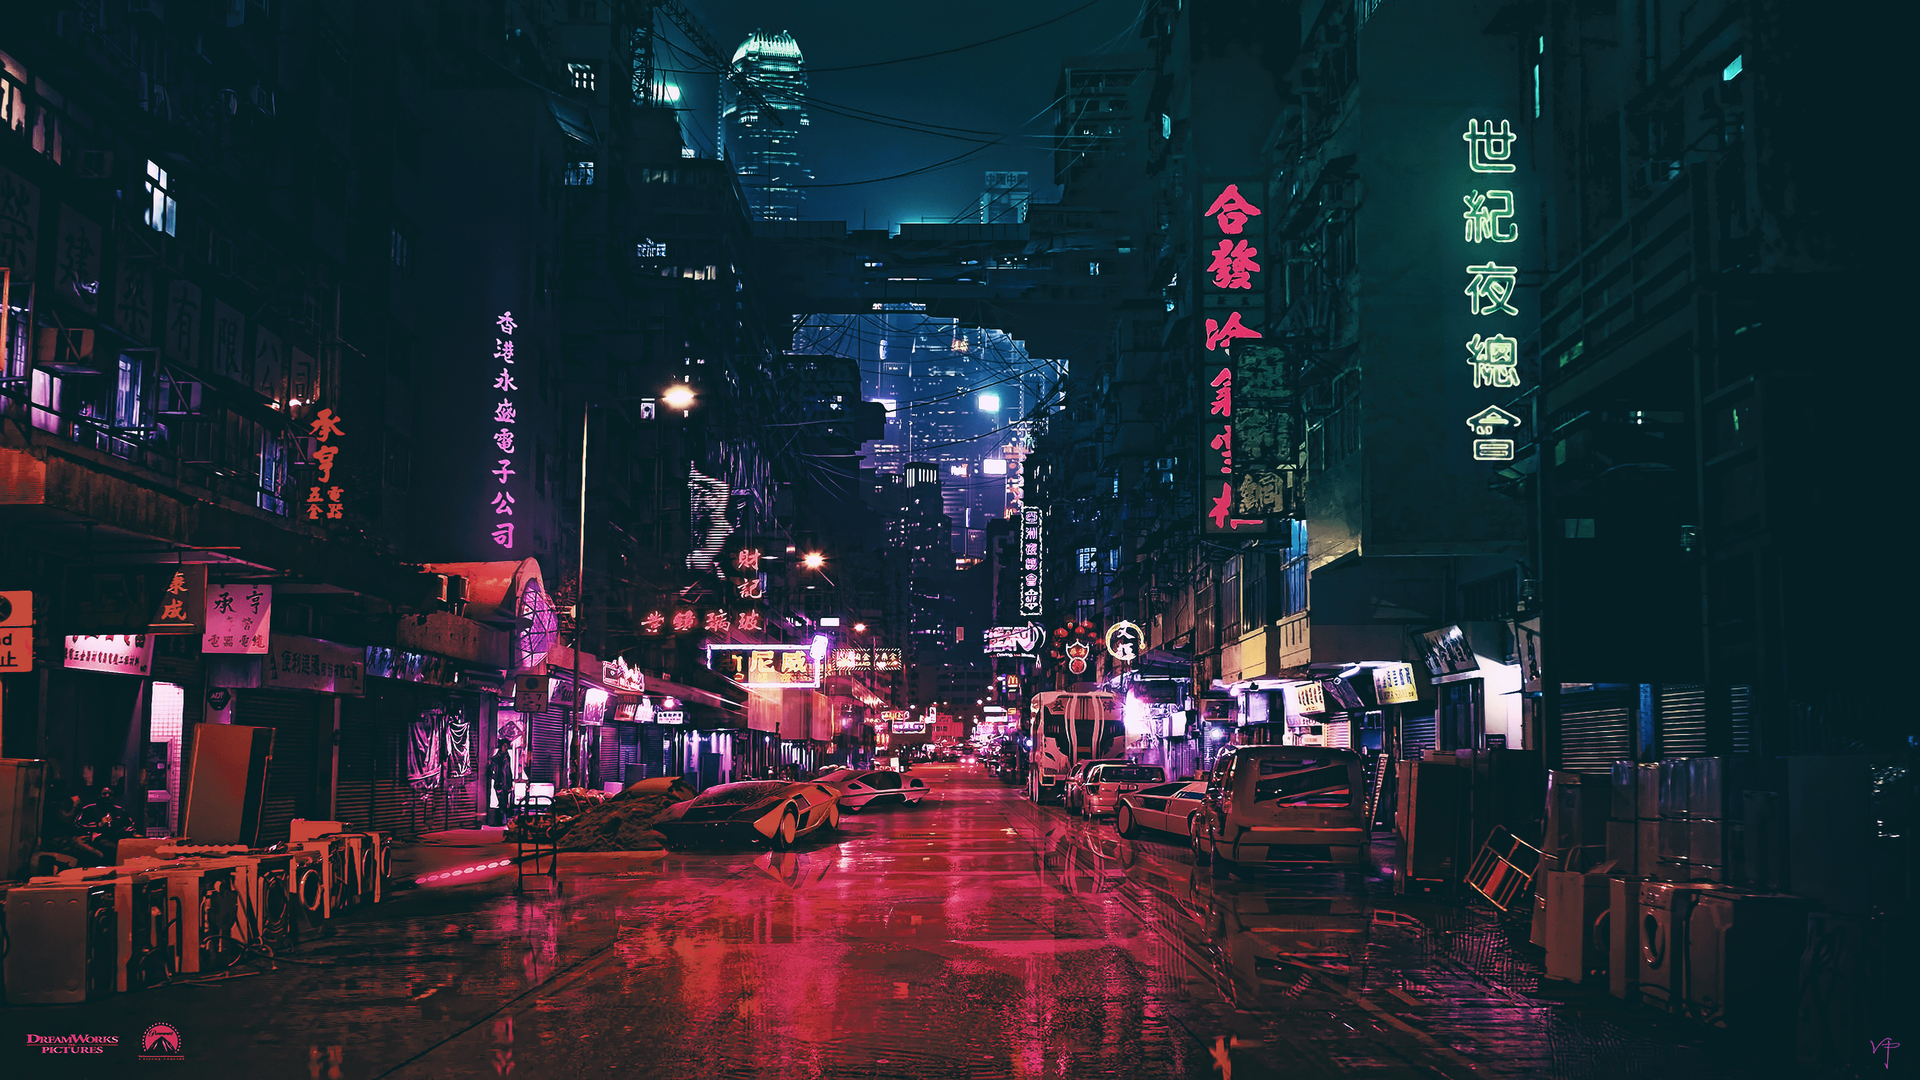 Cyberpunk Futuristic City Science Fiction Concept Art 4k